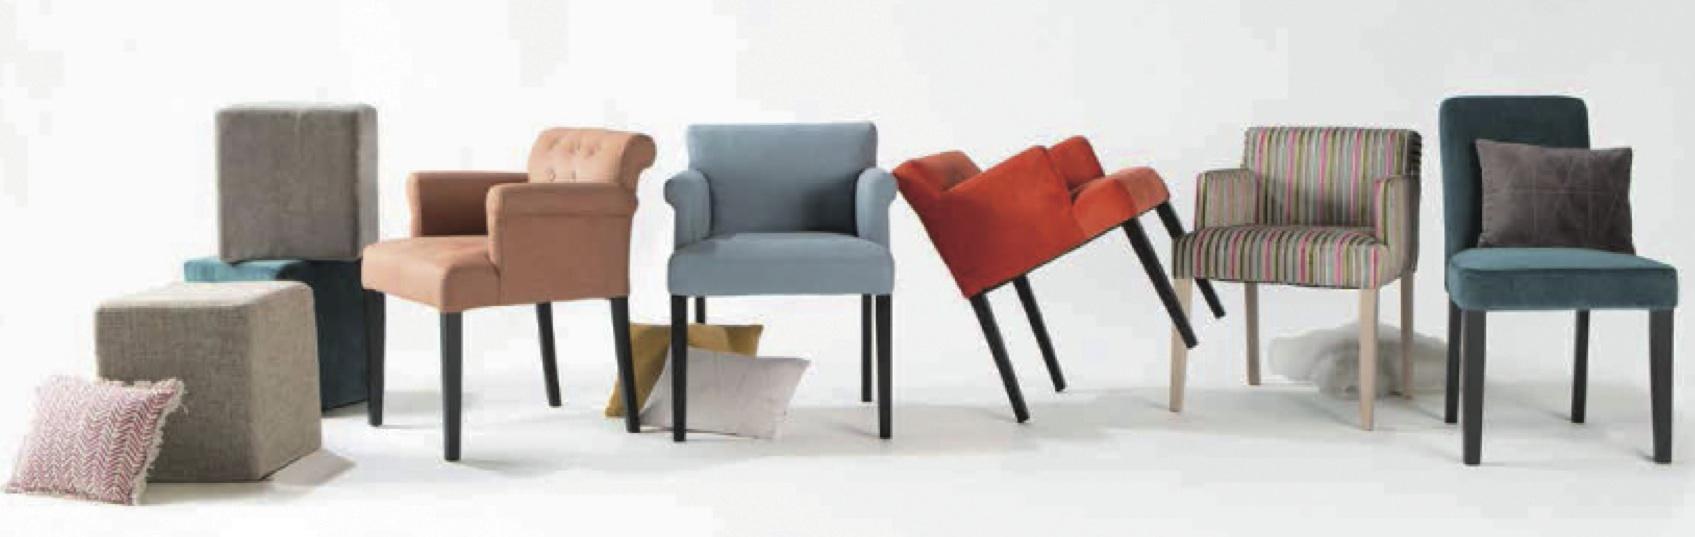 home-spirit-chaises-poufs